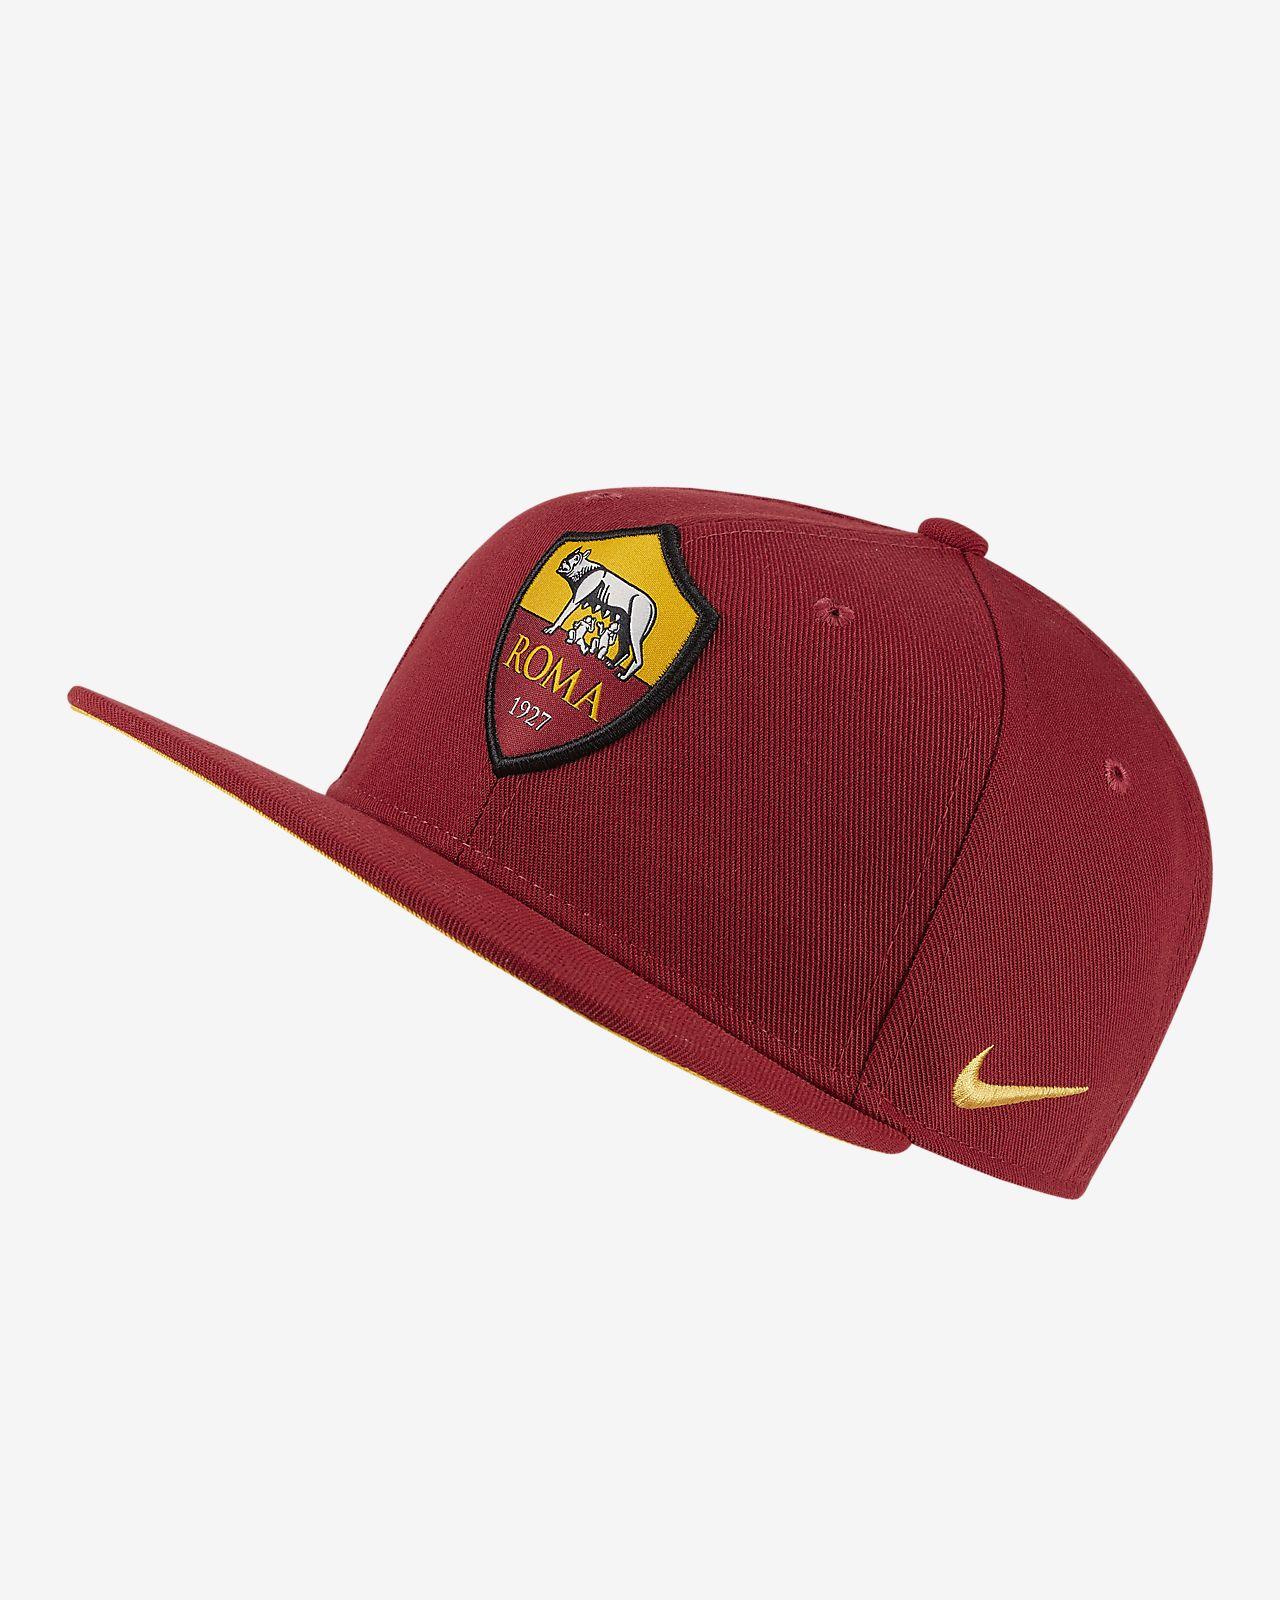 Nike Pro A.S. Roma Older Kids' Adjustable Hat